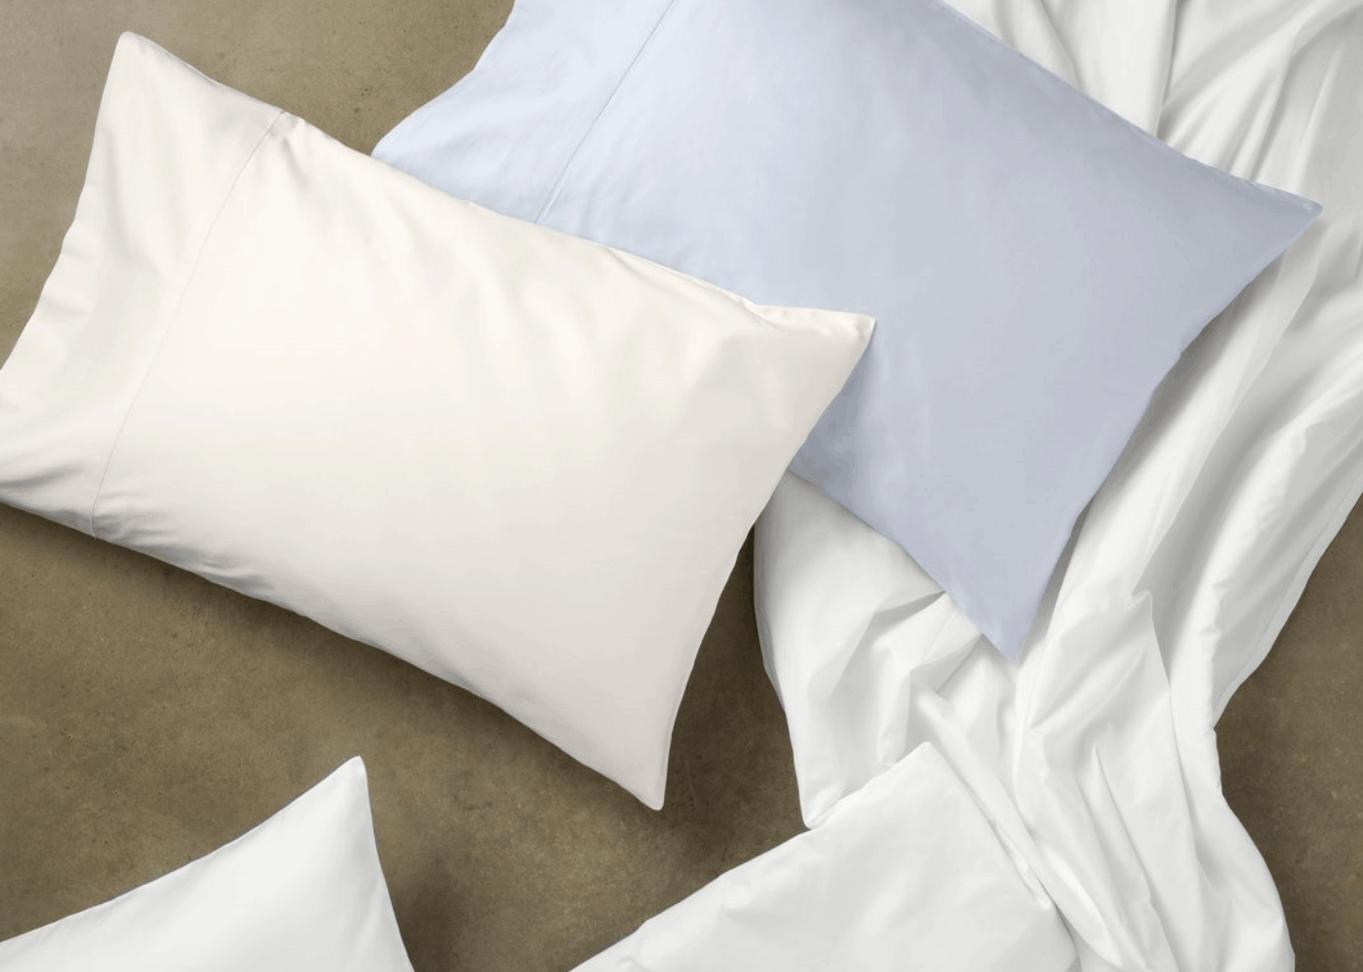 saatva dreams sheets care instructions